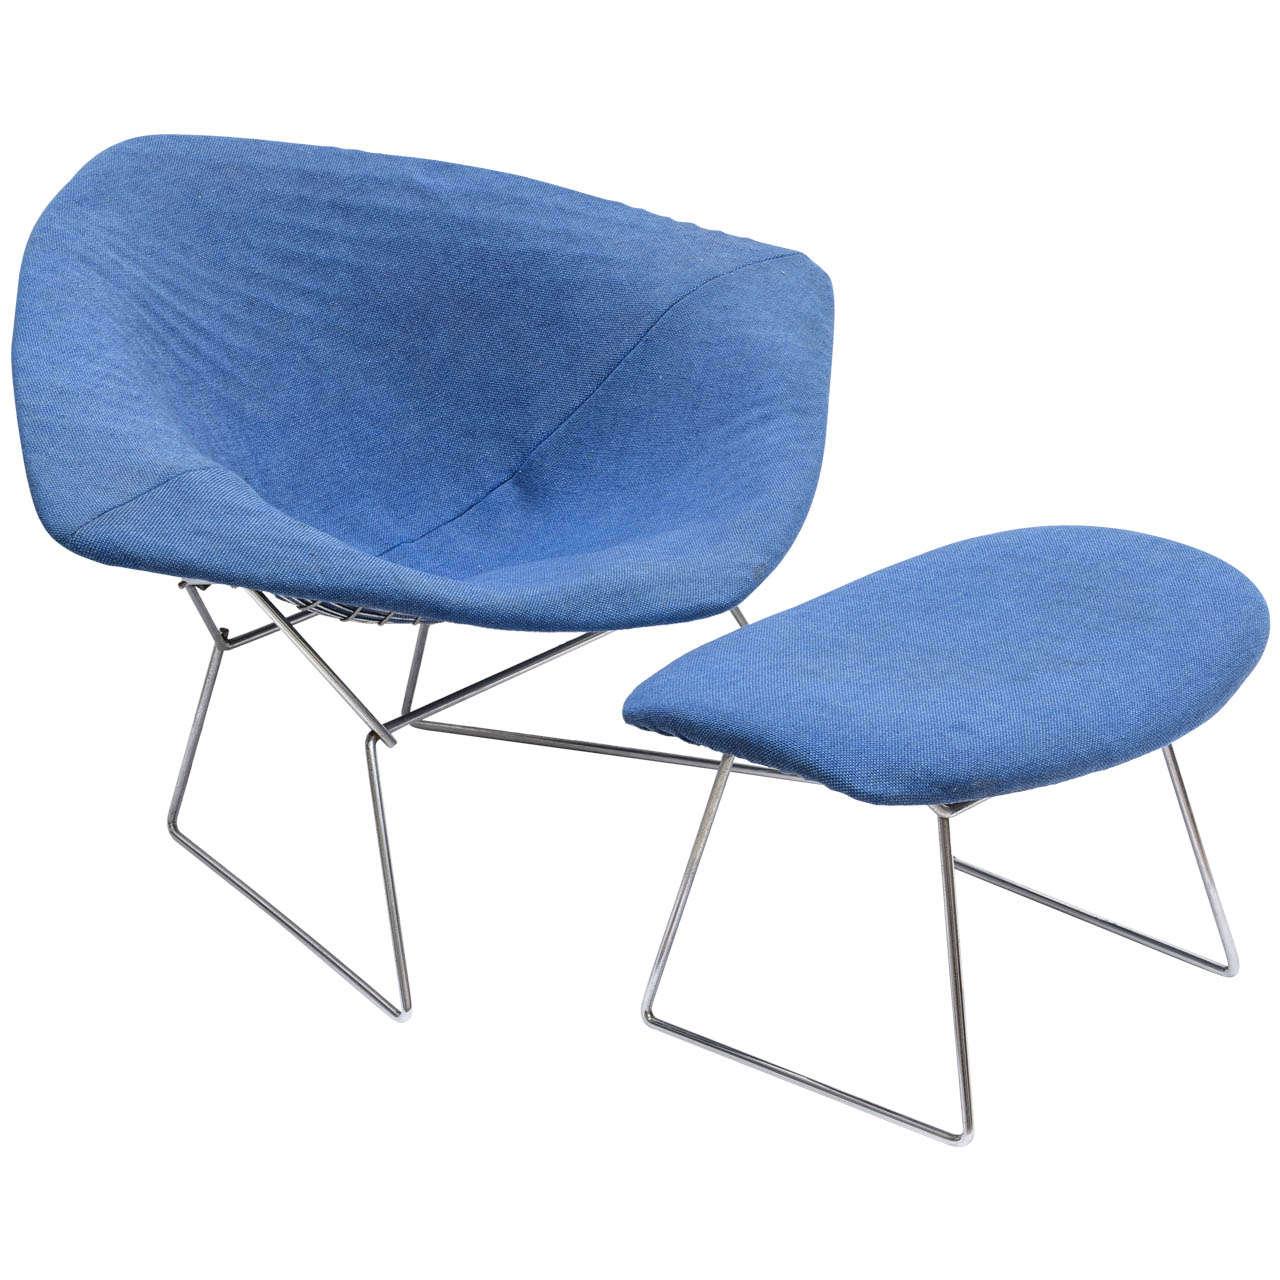 jumbo diamond chair and ottoman by harry bertoia at 1stdibs. Black Bedroom Furniture Sets. Home Design Ideas